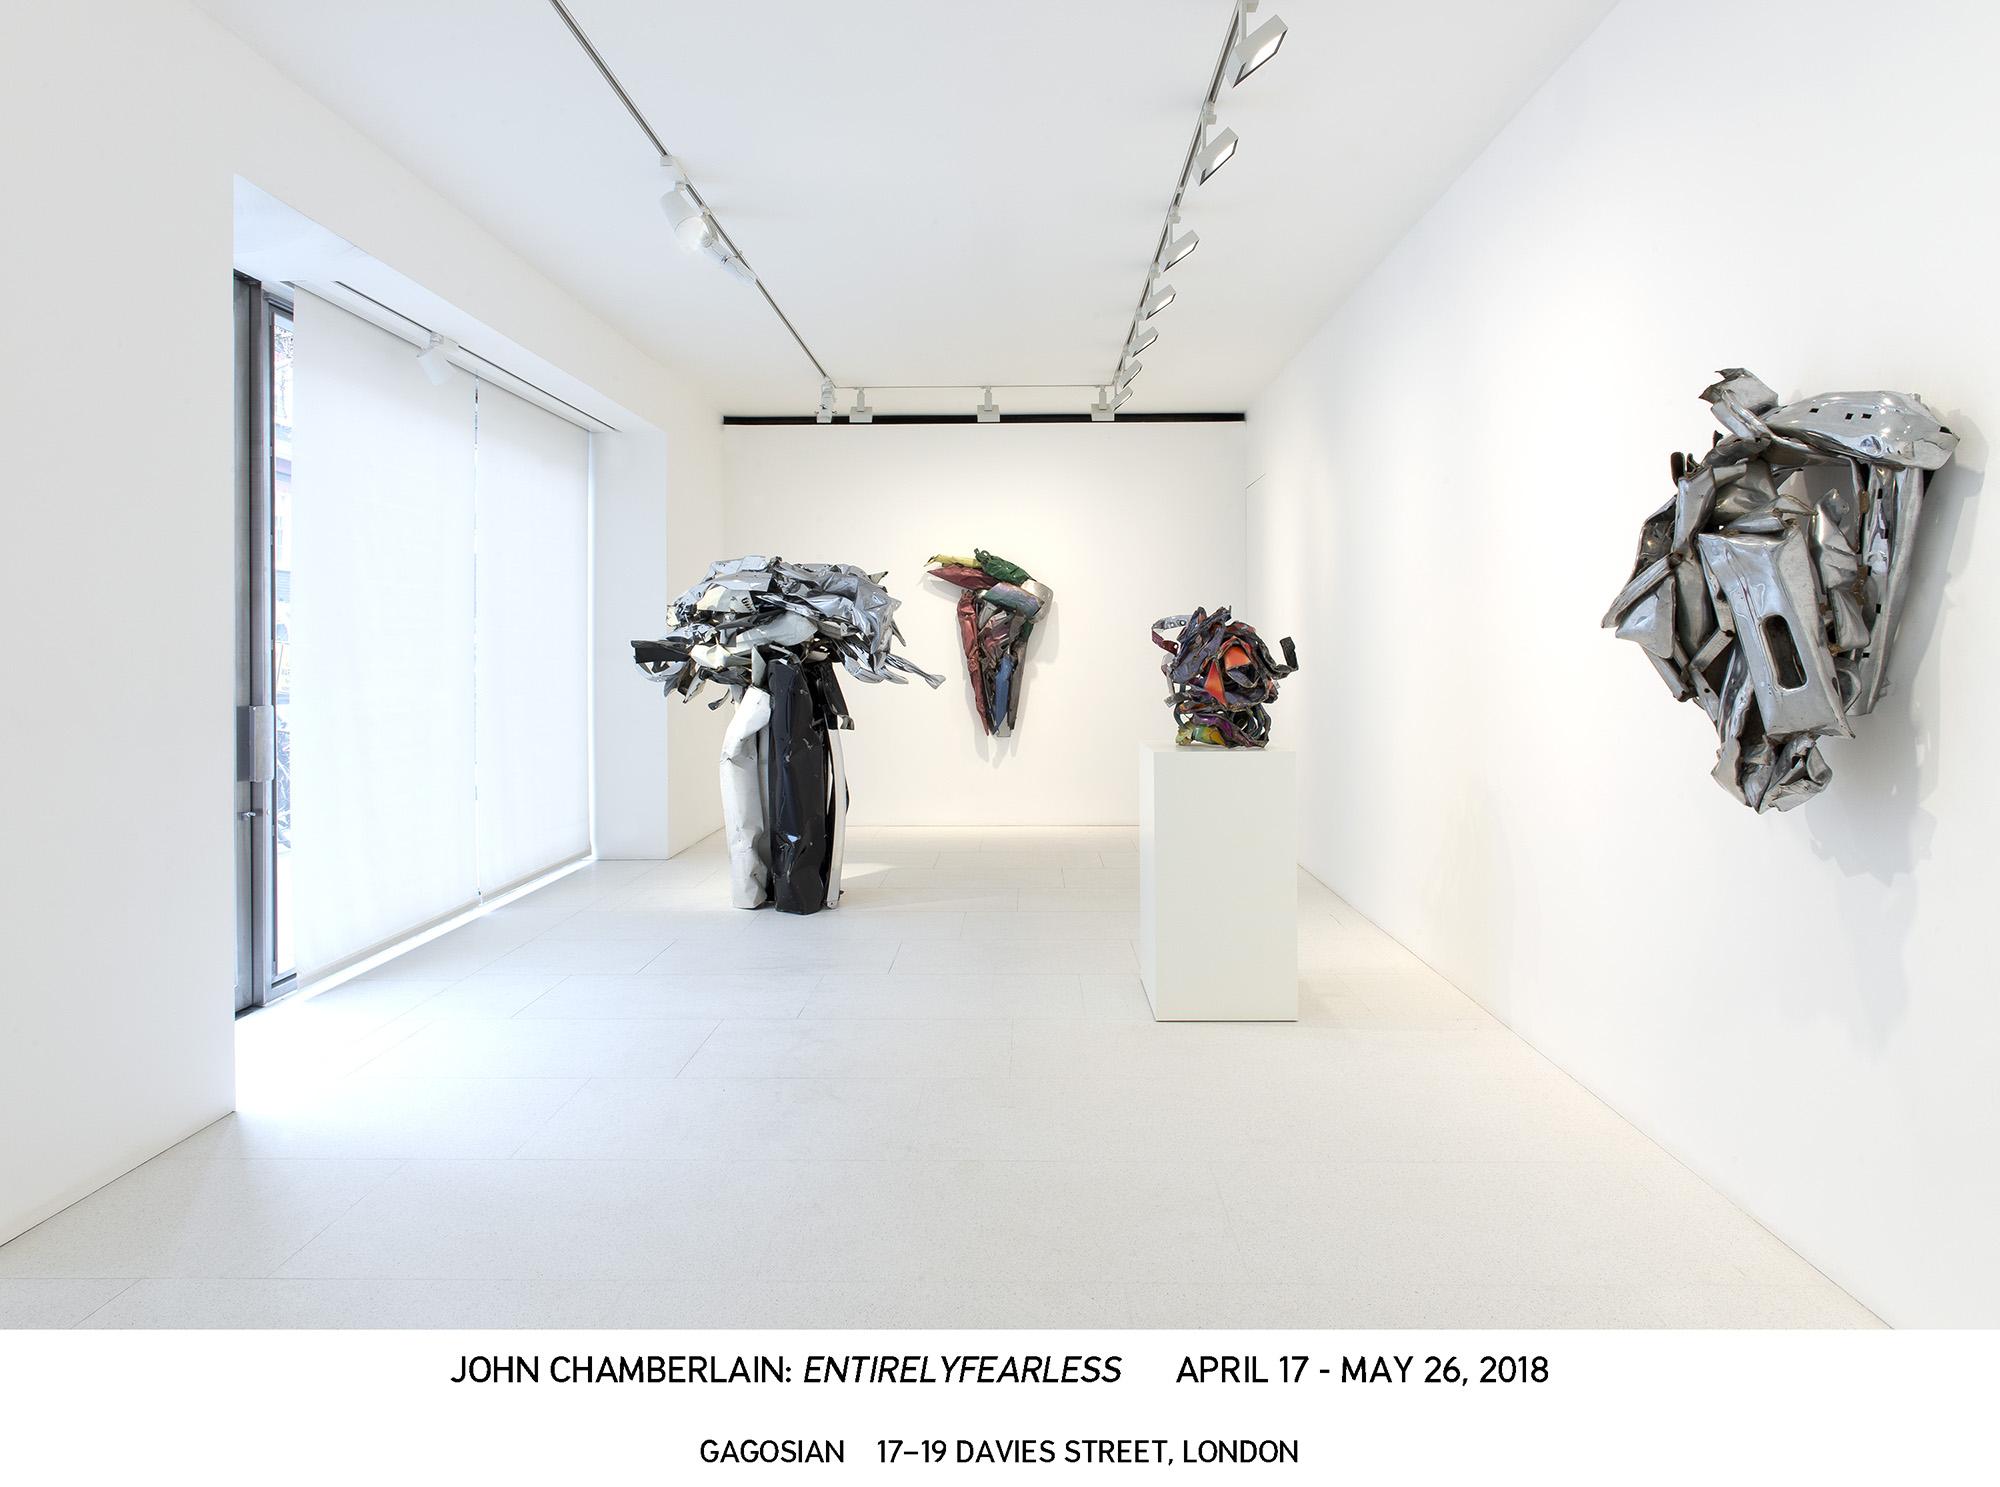 CHAMBERLAIN 2018 ENTIRELYFEARLESS Installation view 3 (blinds down).jpg